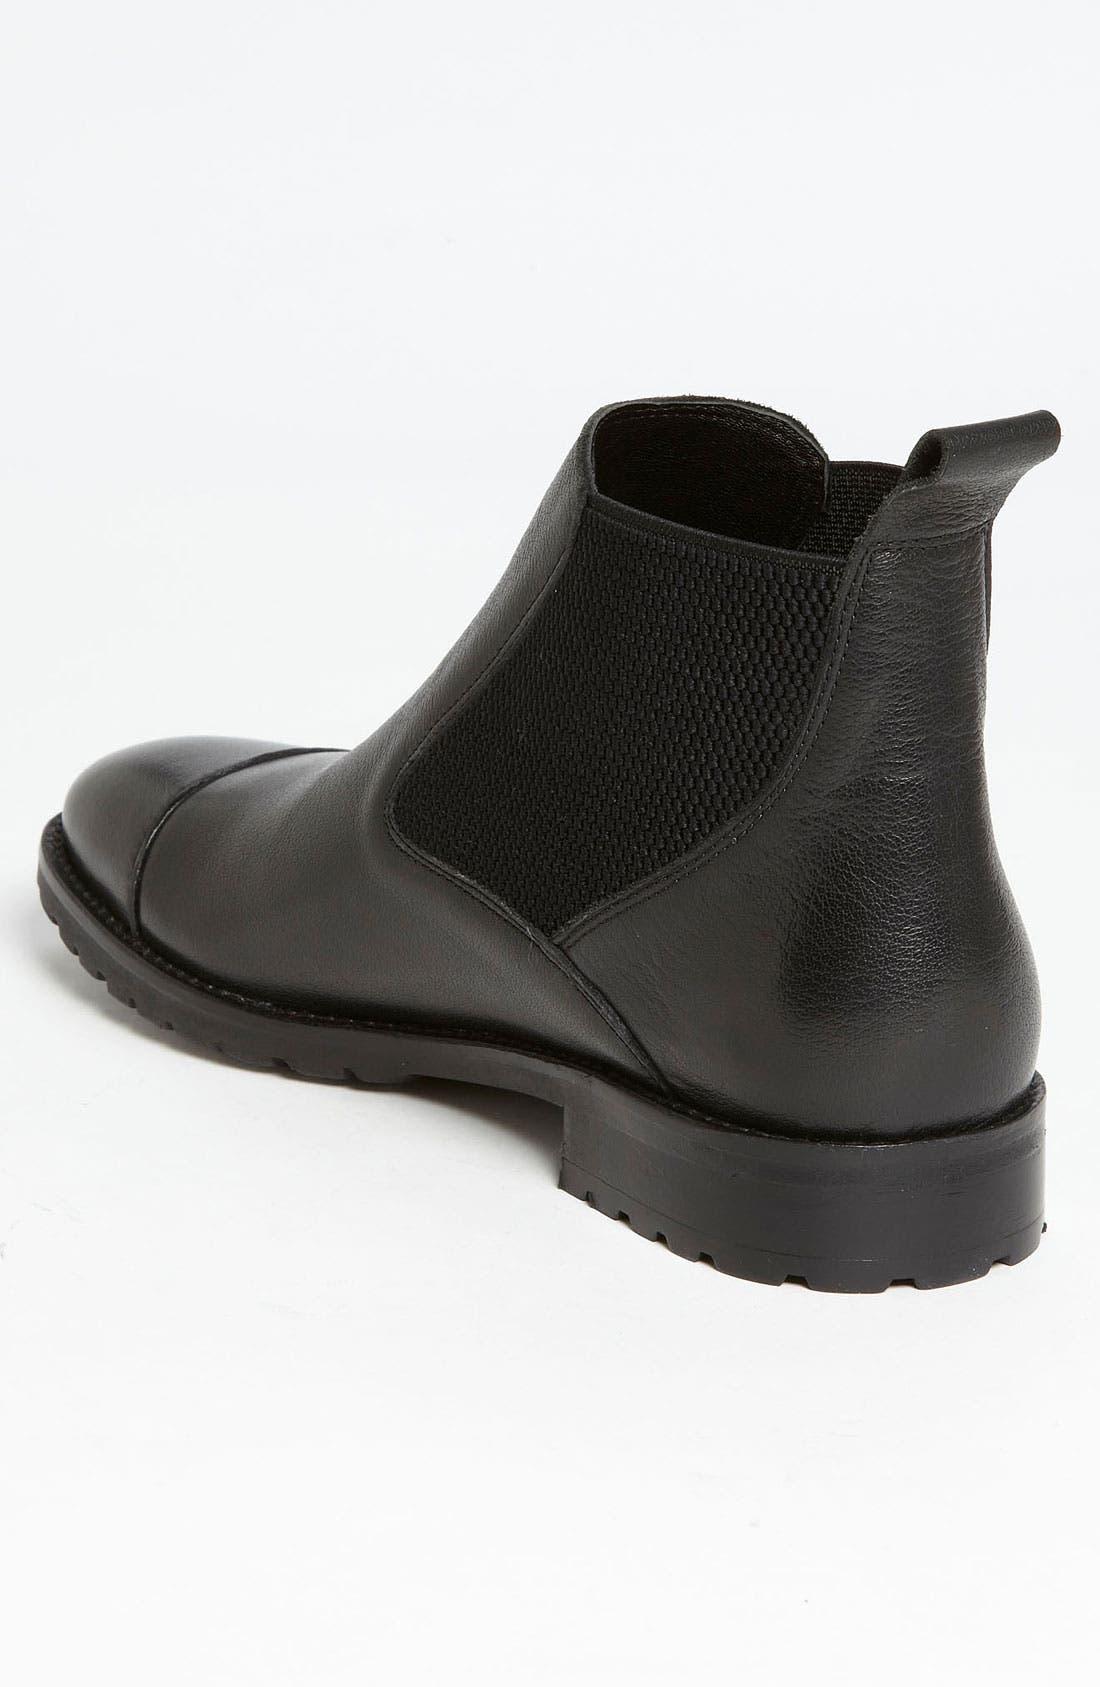 Alternate Image 2  - Maison Forte 'Carlos' Chelsea Boot